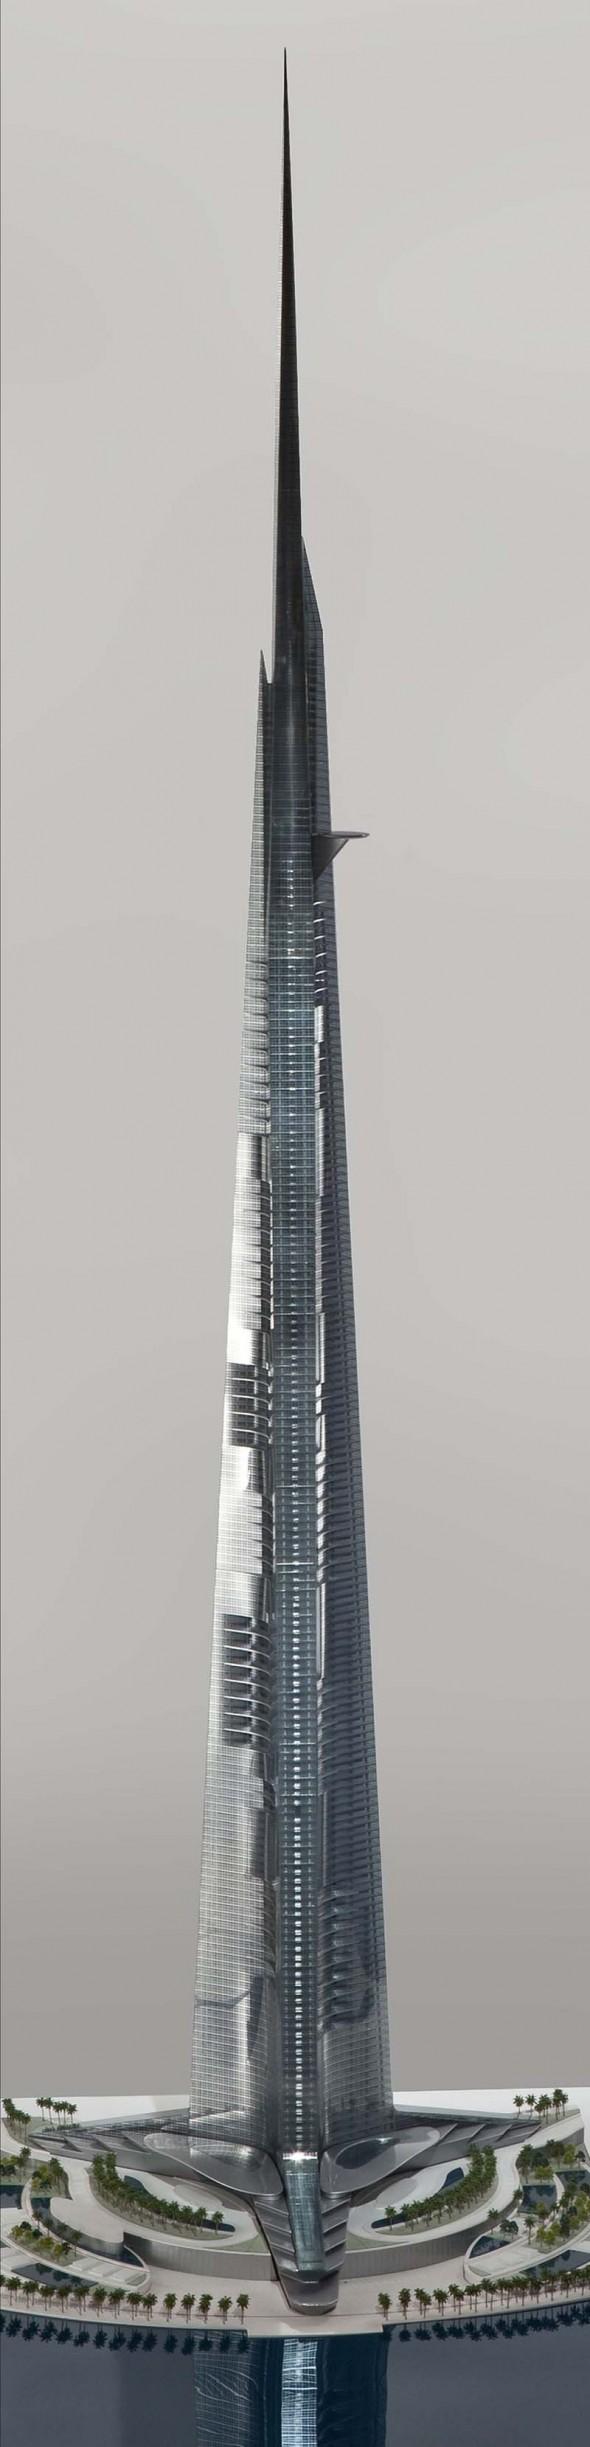 Kingdom Tower Jeddah